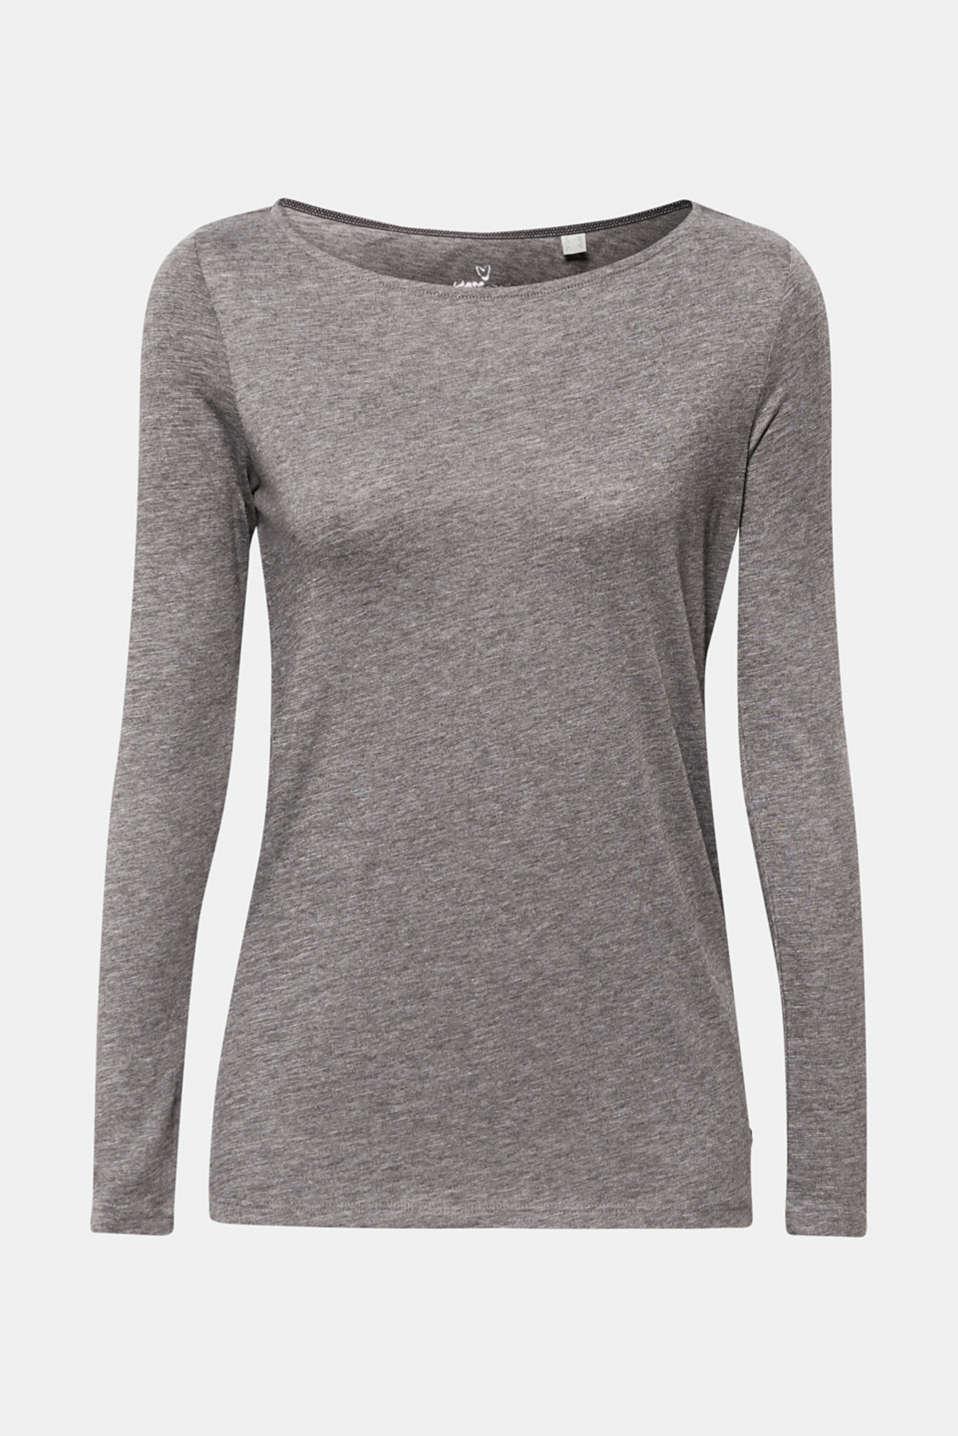 Long sleeve slub top with organic cotton, DARK GREY 4, detail image number 6